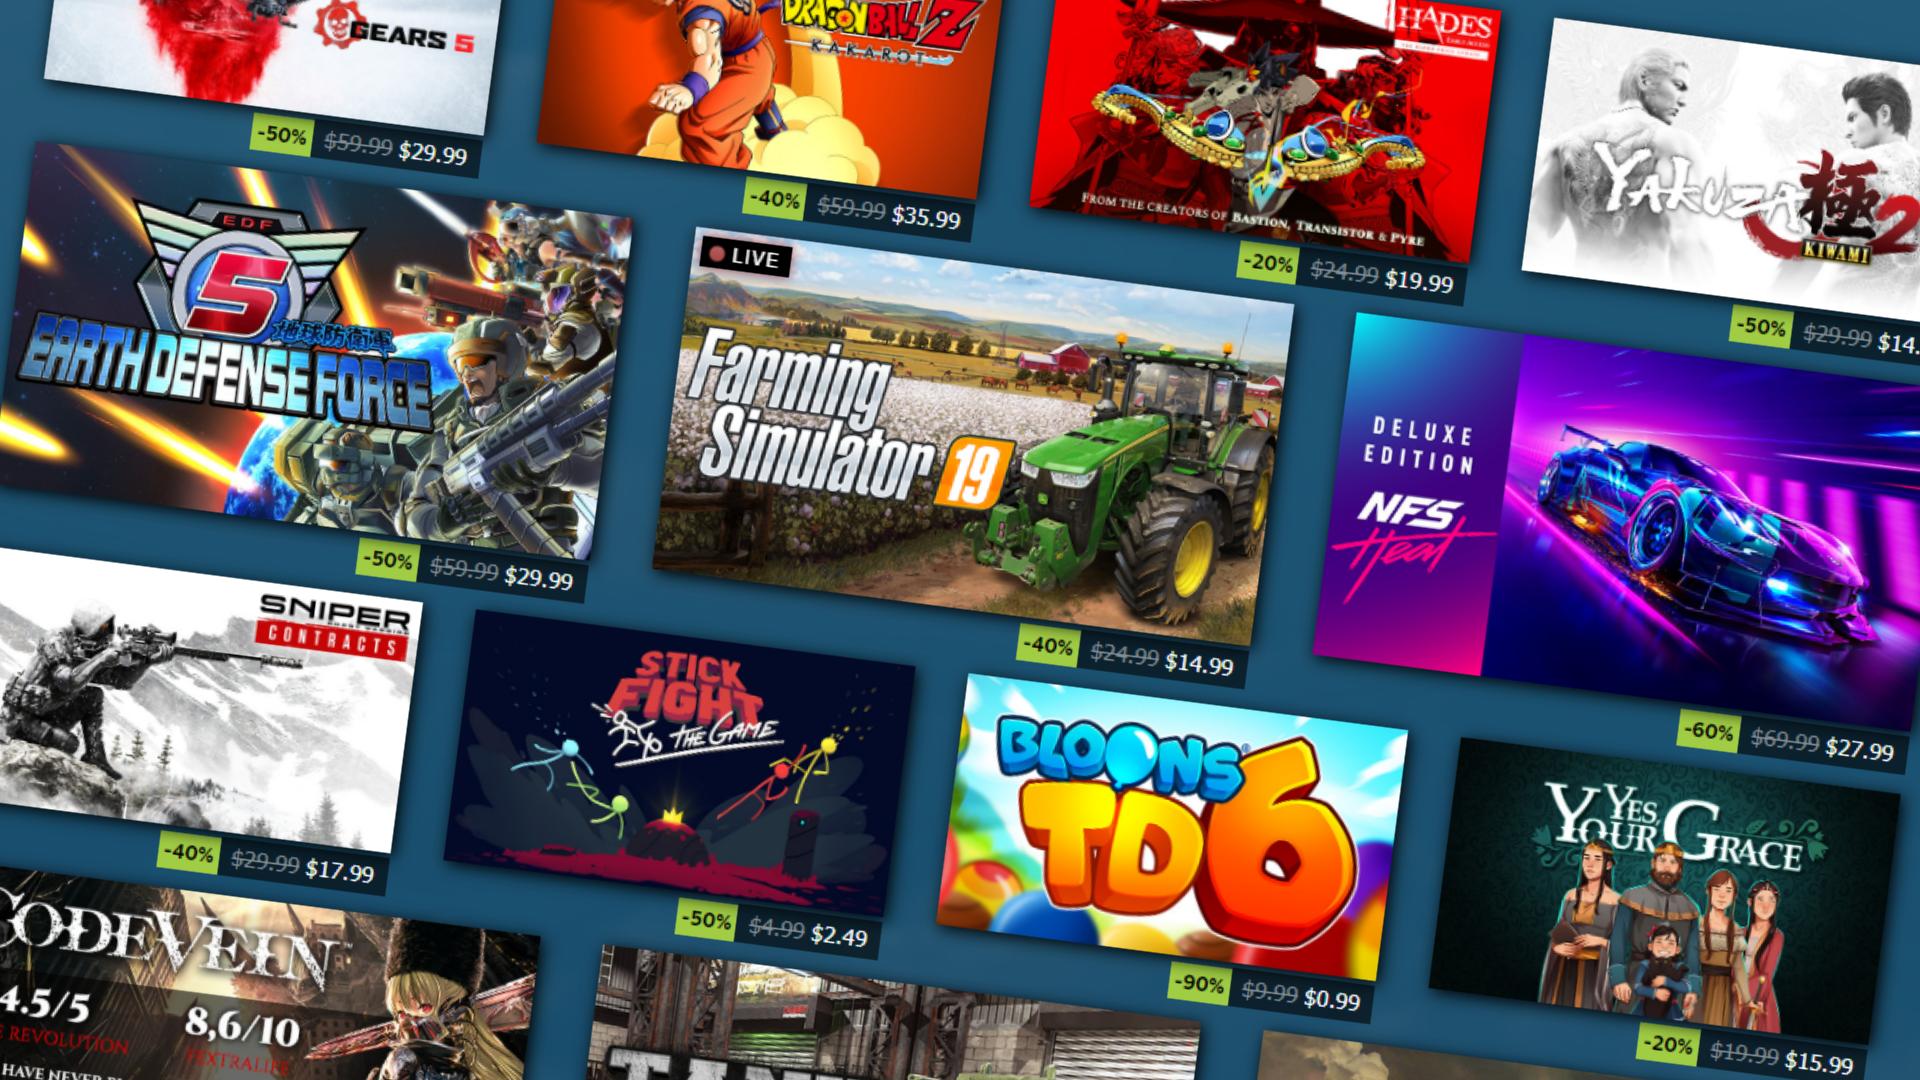 The Best Deals In The Steam Summer Sale Pc Gamer